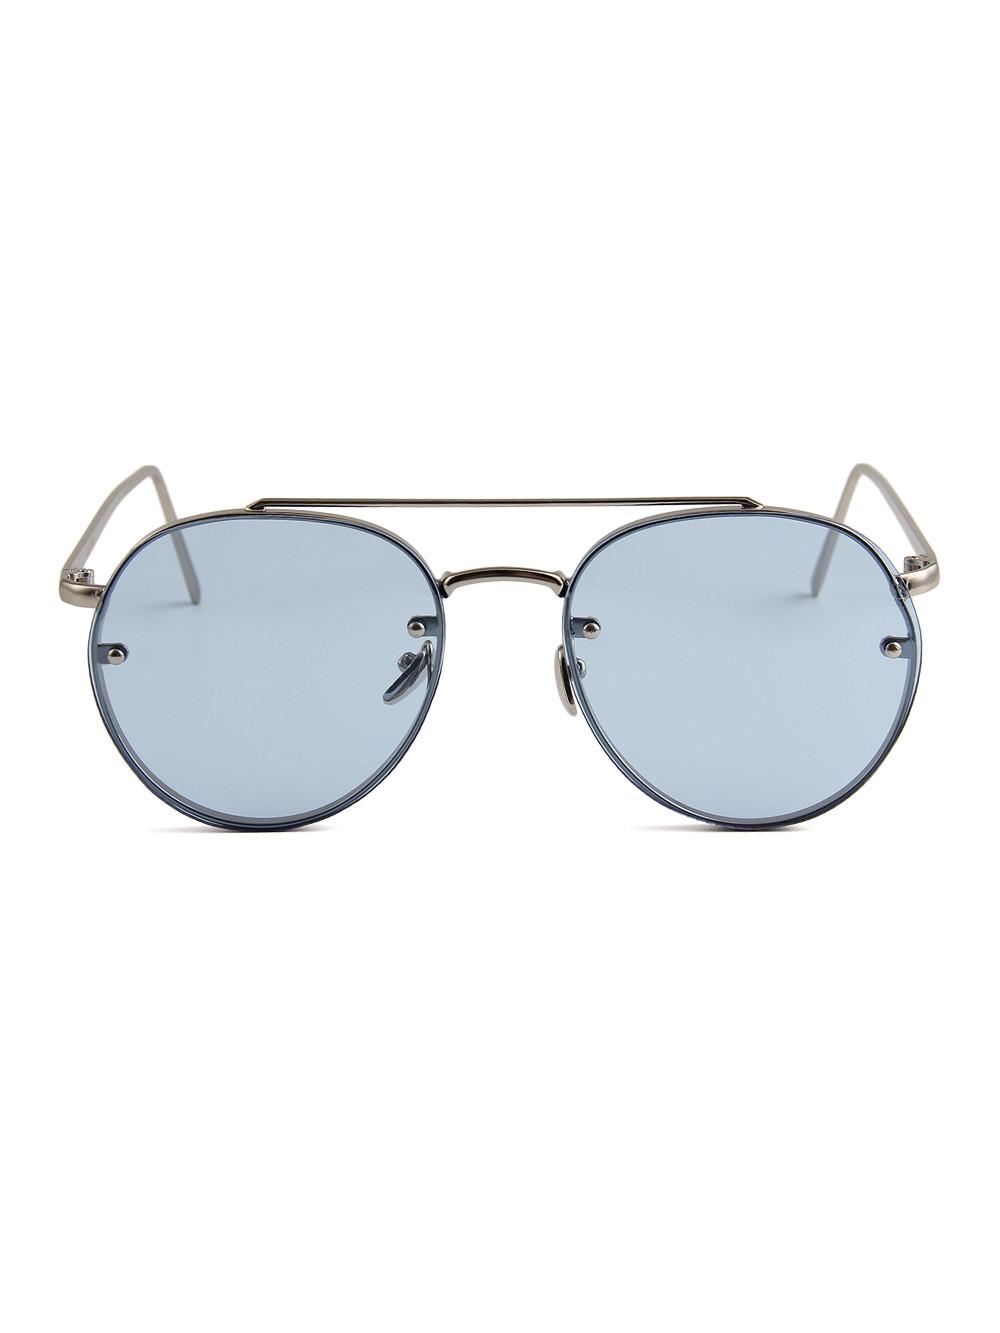 Slnečné okuliare Hipster Blue 3ea4e5ed83f